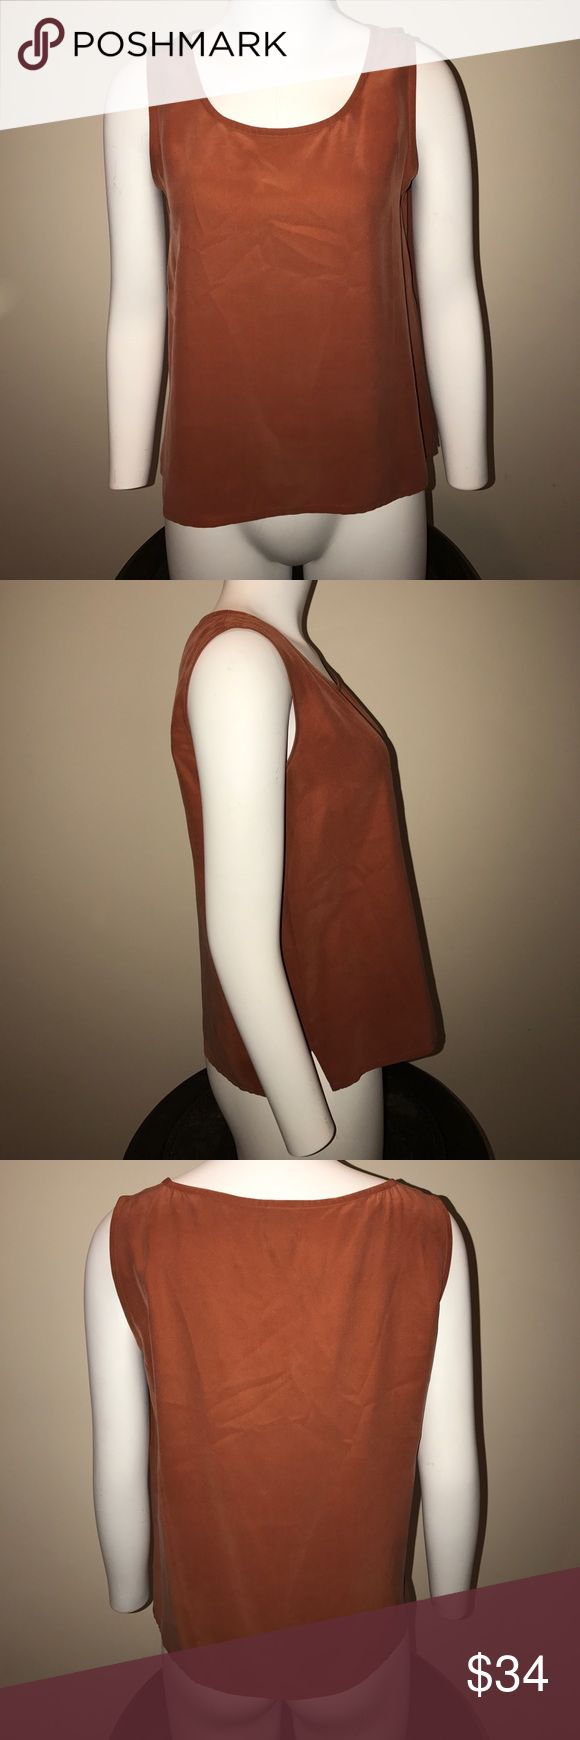 Eileen Fisher Silk Tank Excellent condition. Burnt orange/caramel color. 100% silk. Eileen Fisher Tops Tank Tops